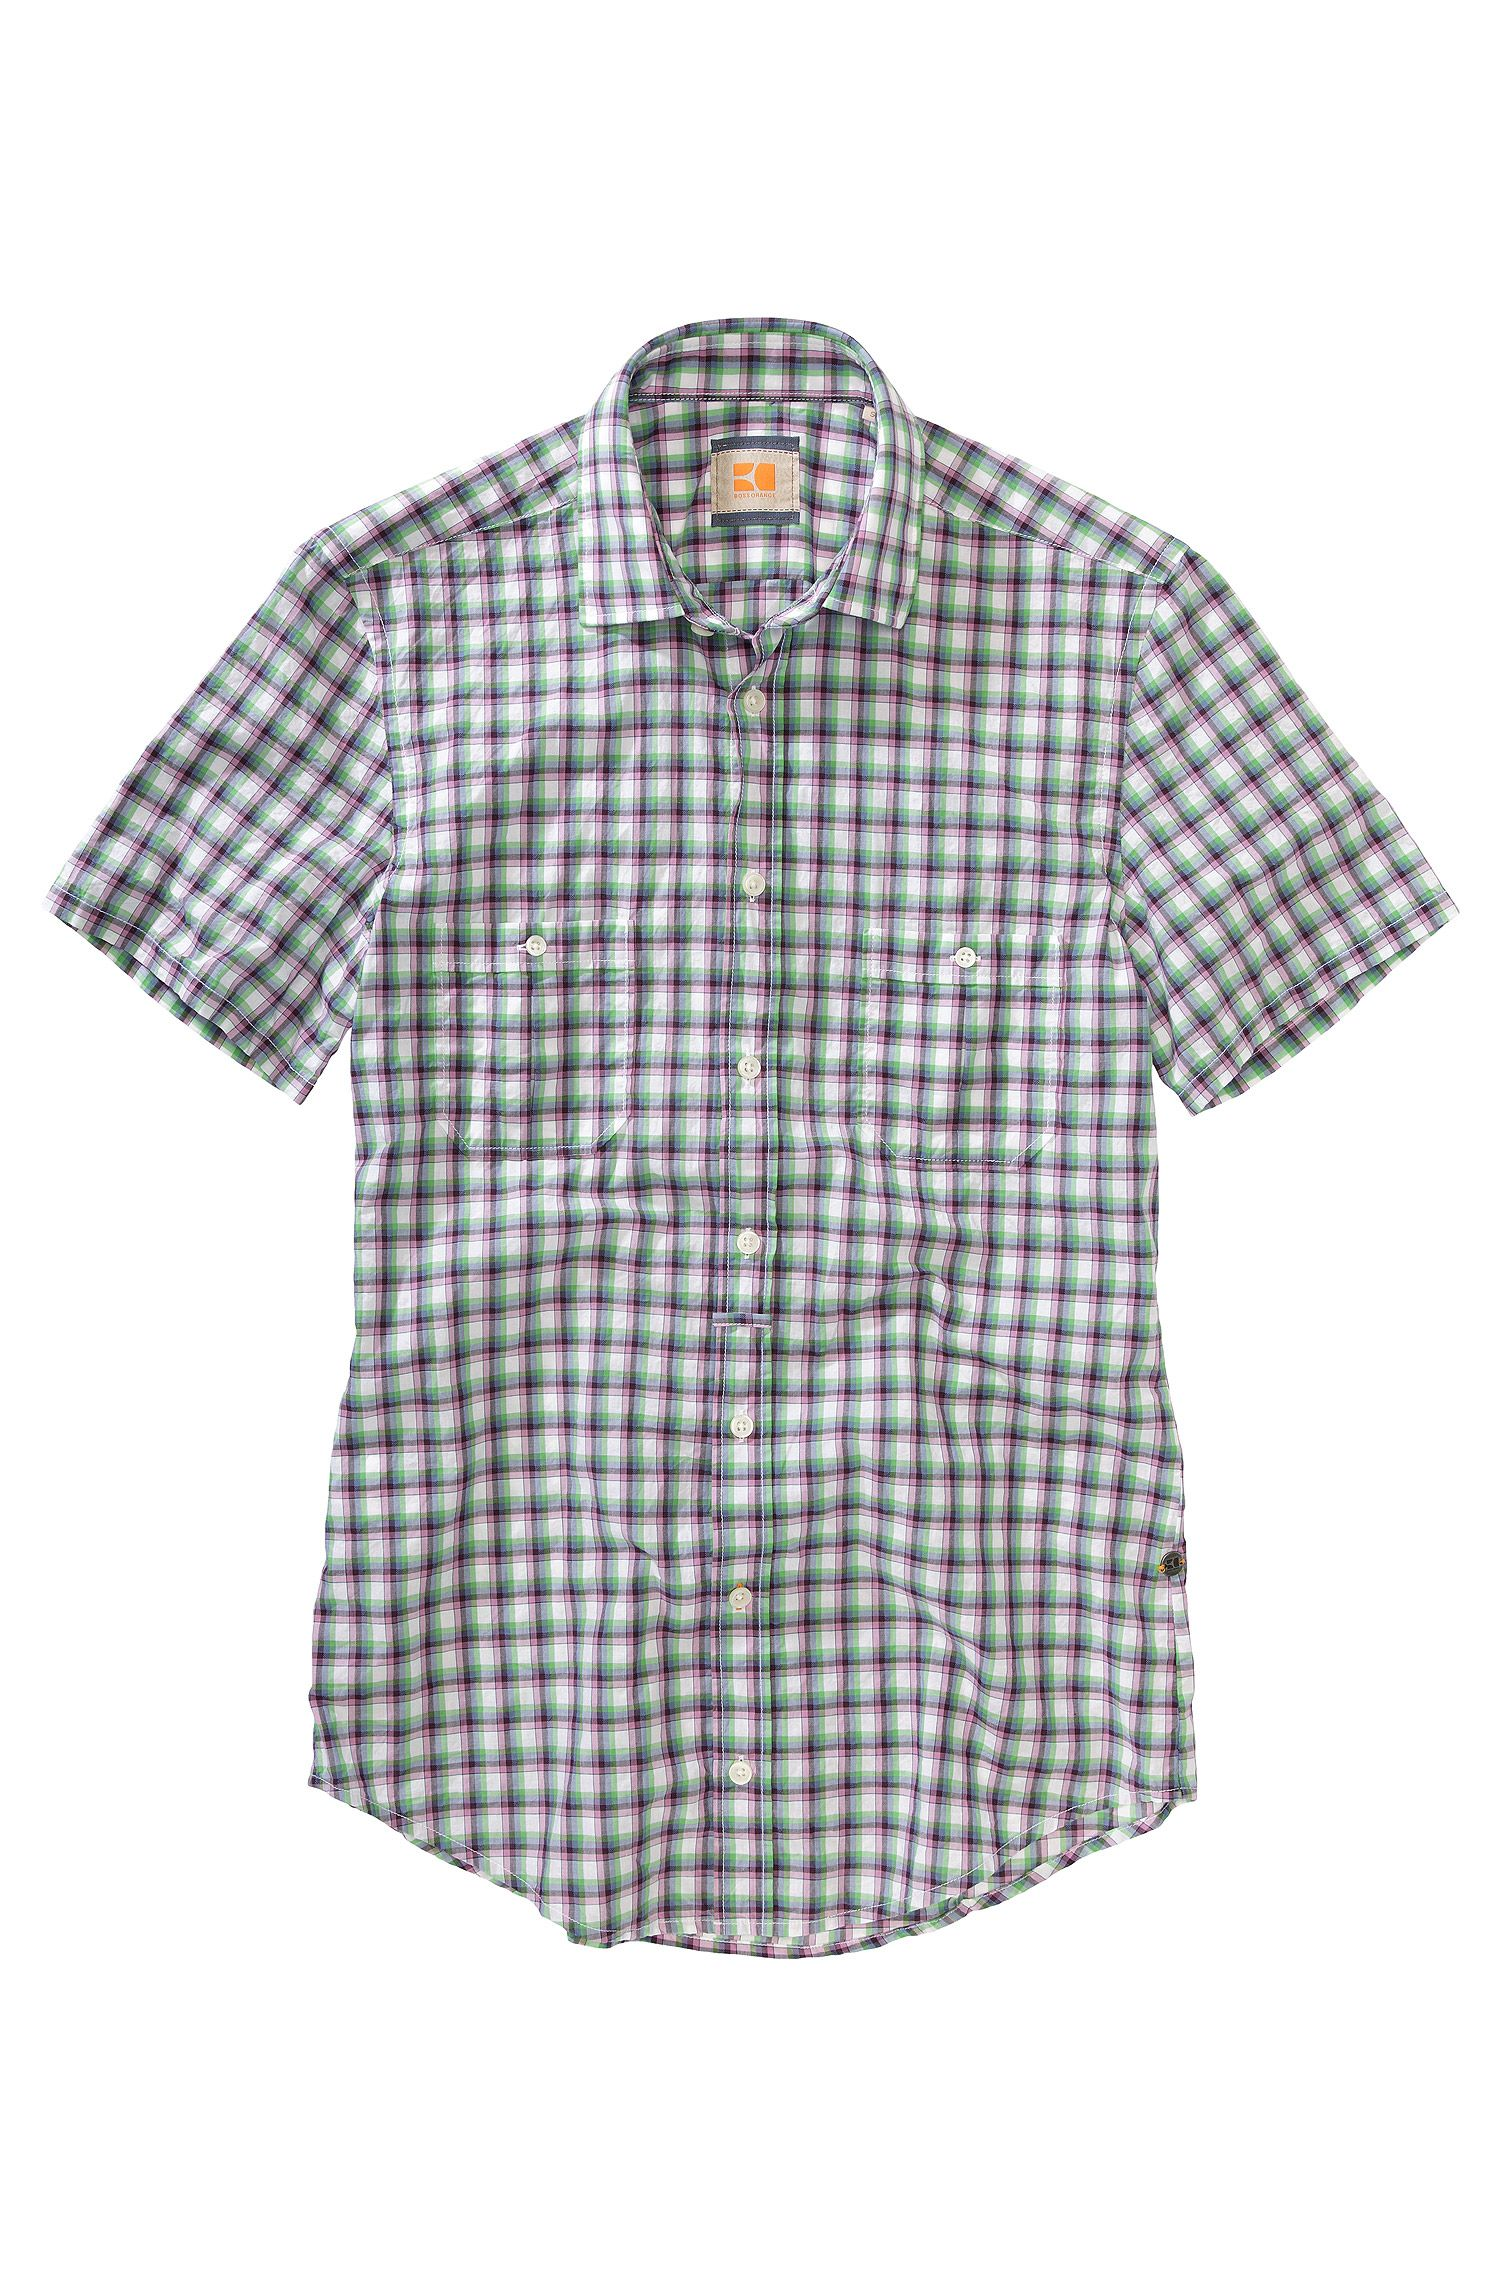 Freizeit-Hemd ´EgrifyE`, verstärkter Kentkragen